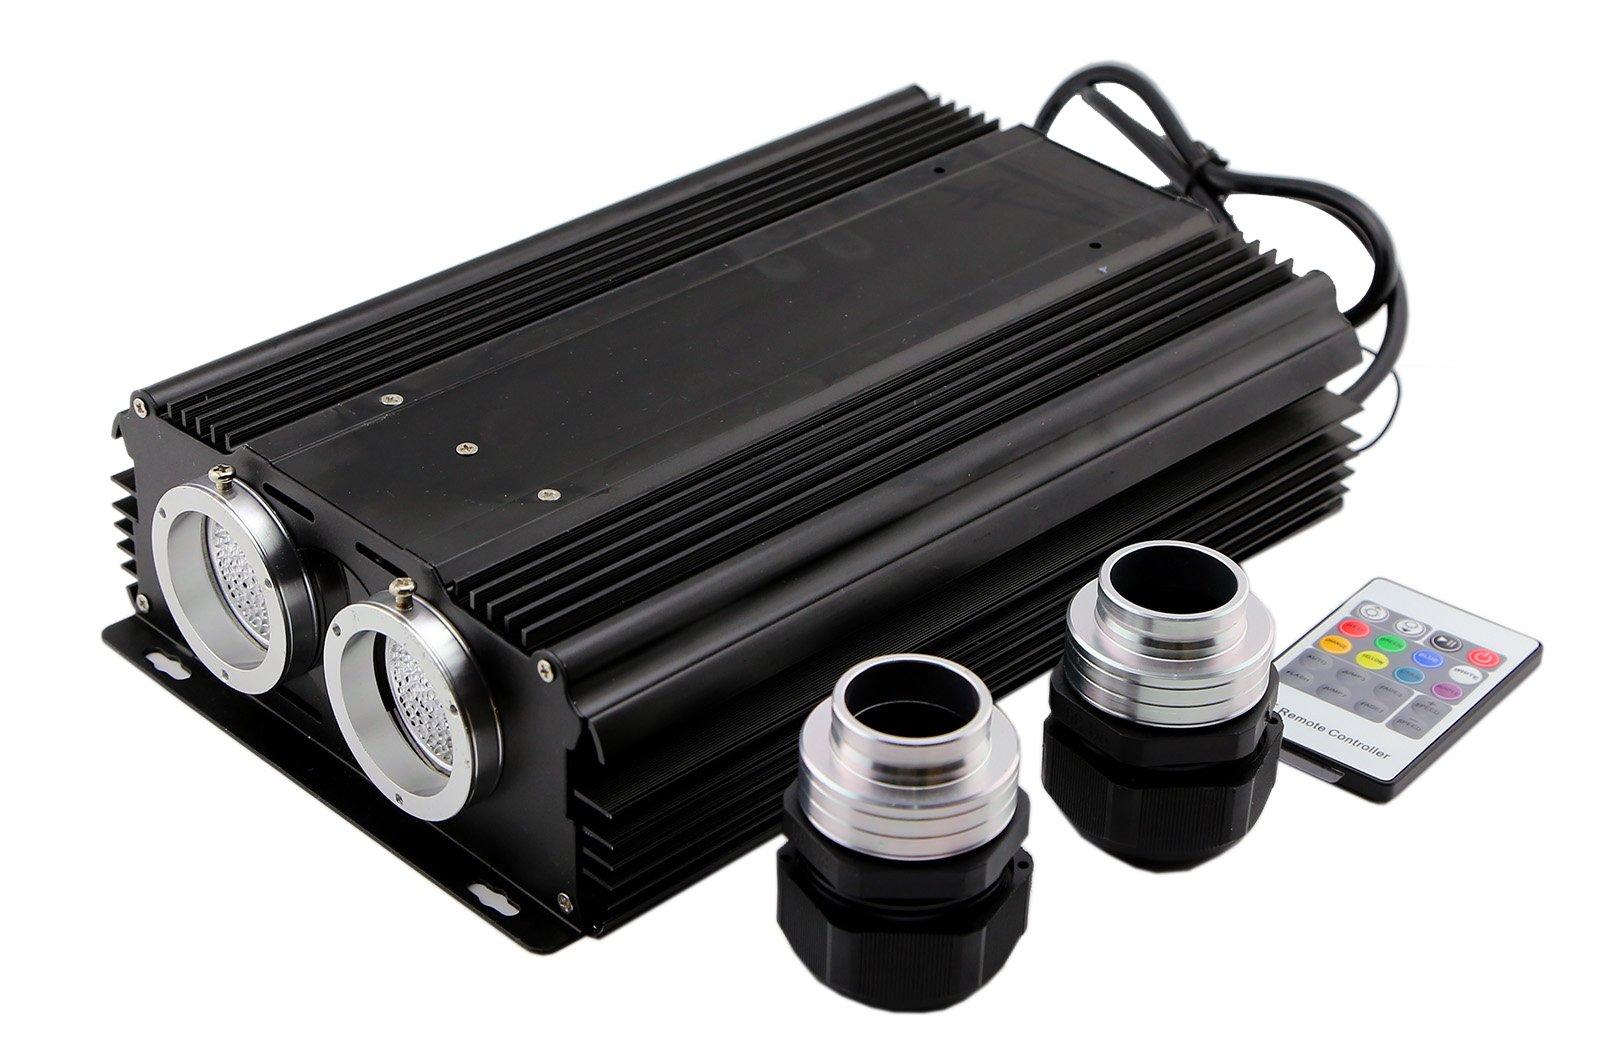 60w Fiber Optic Lamp Dual Output Cree Led Light Engine Optical Fiber Light Box Wireless Rf Remote